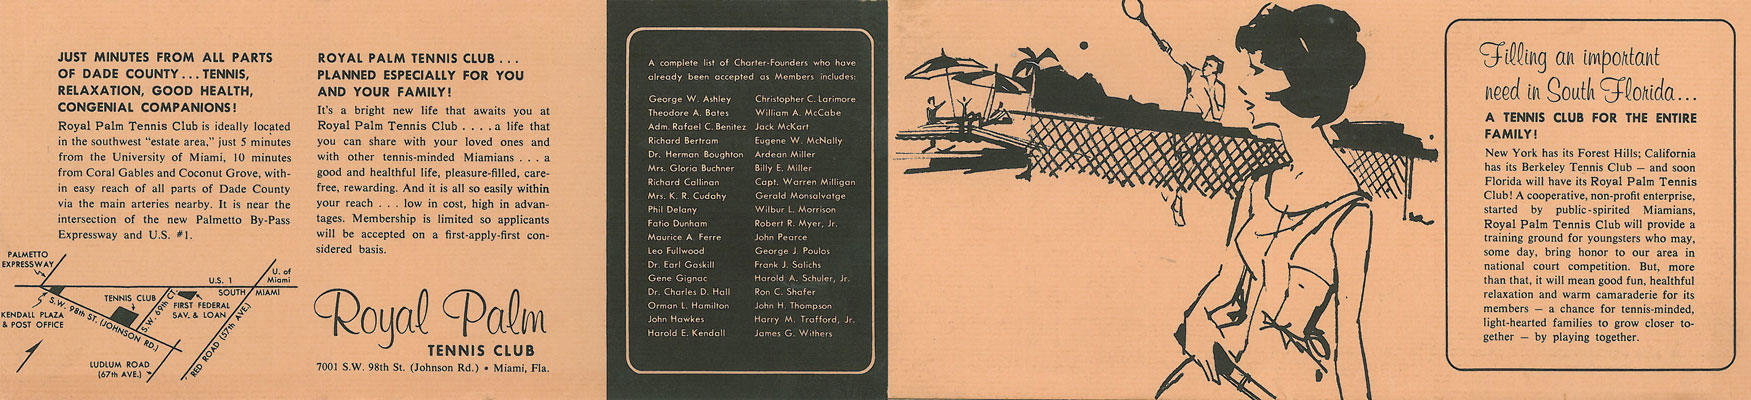 rptc-history-brochure-inside